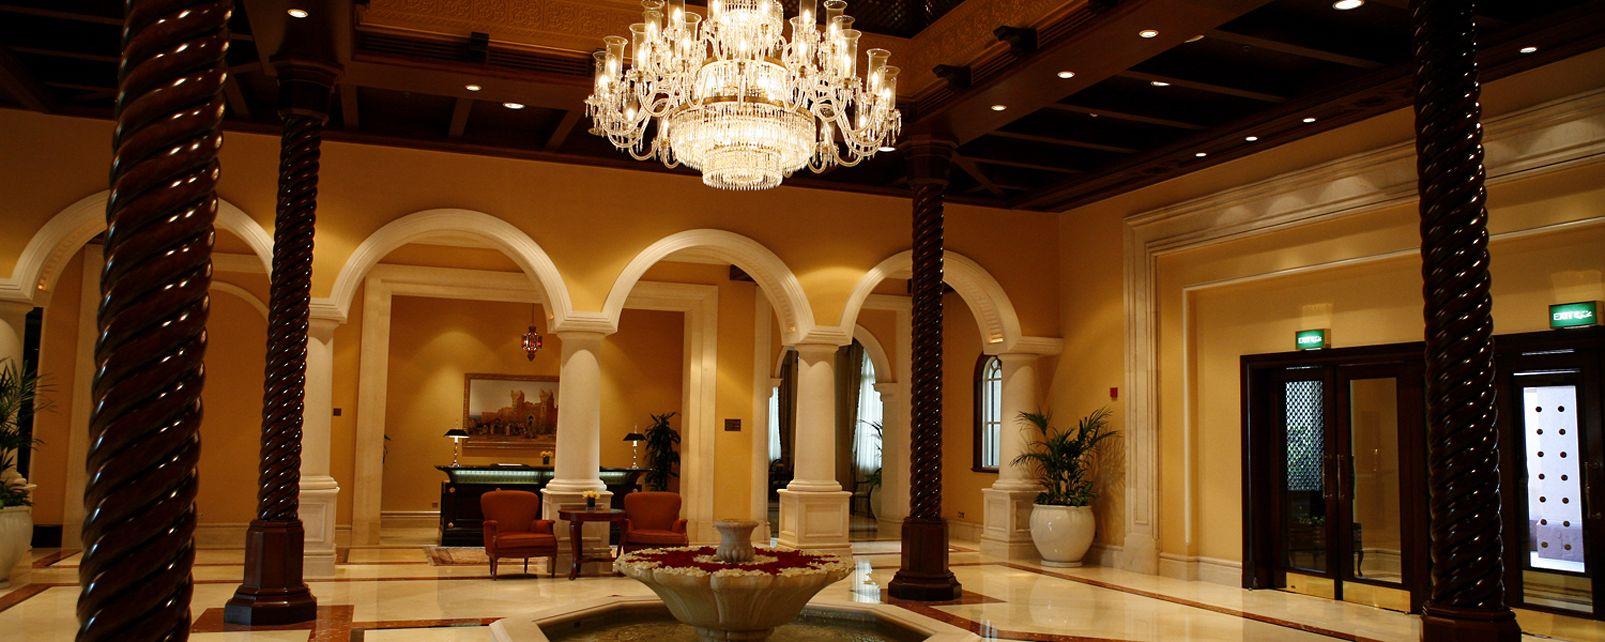 Hôtel Ritz Carlton